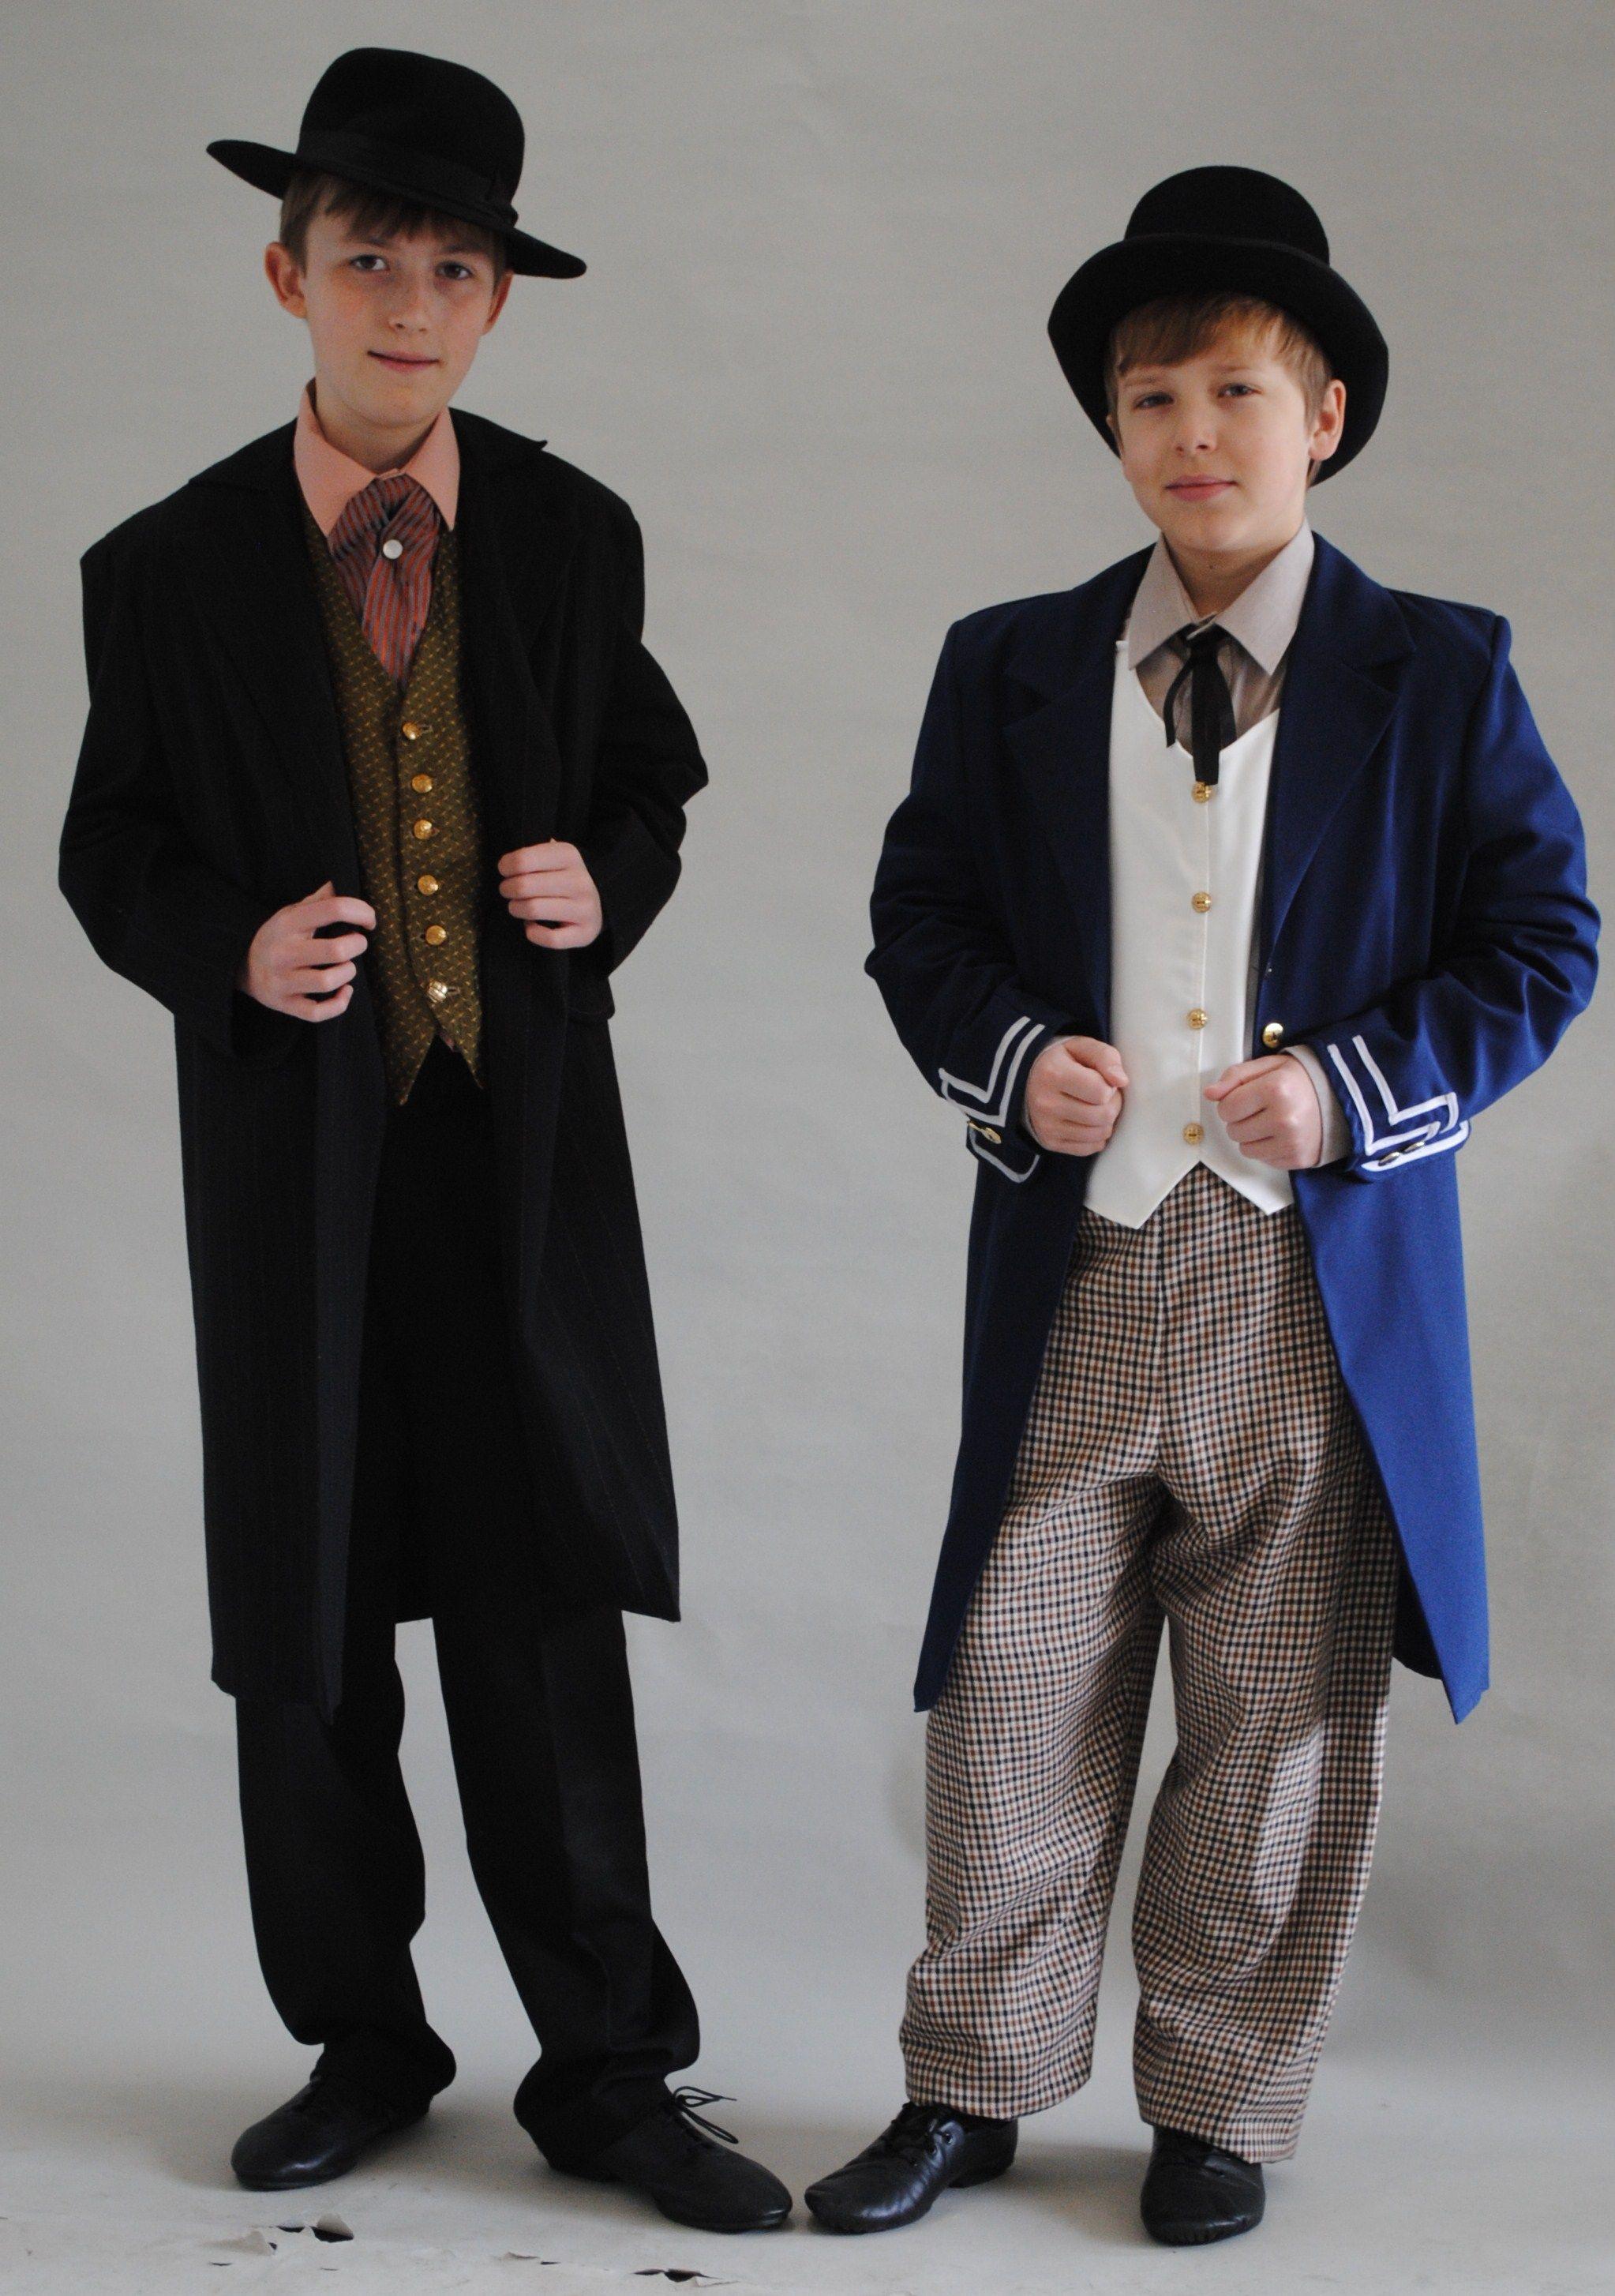 Victorian boy costumes